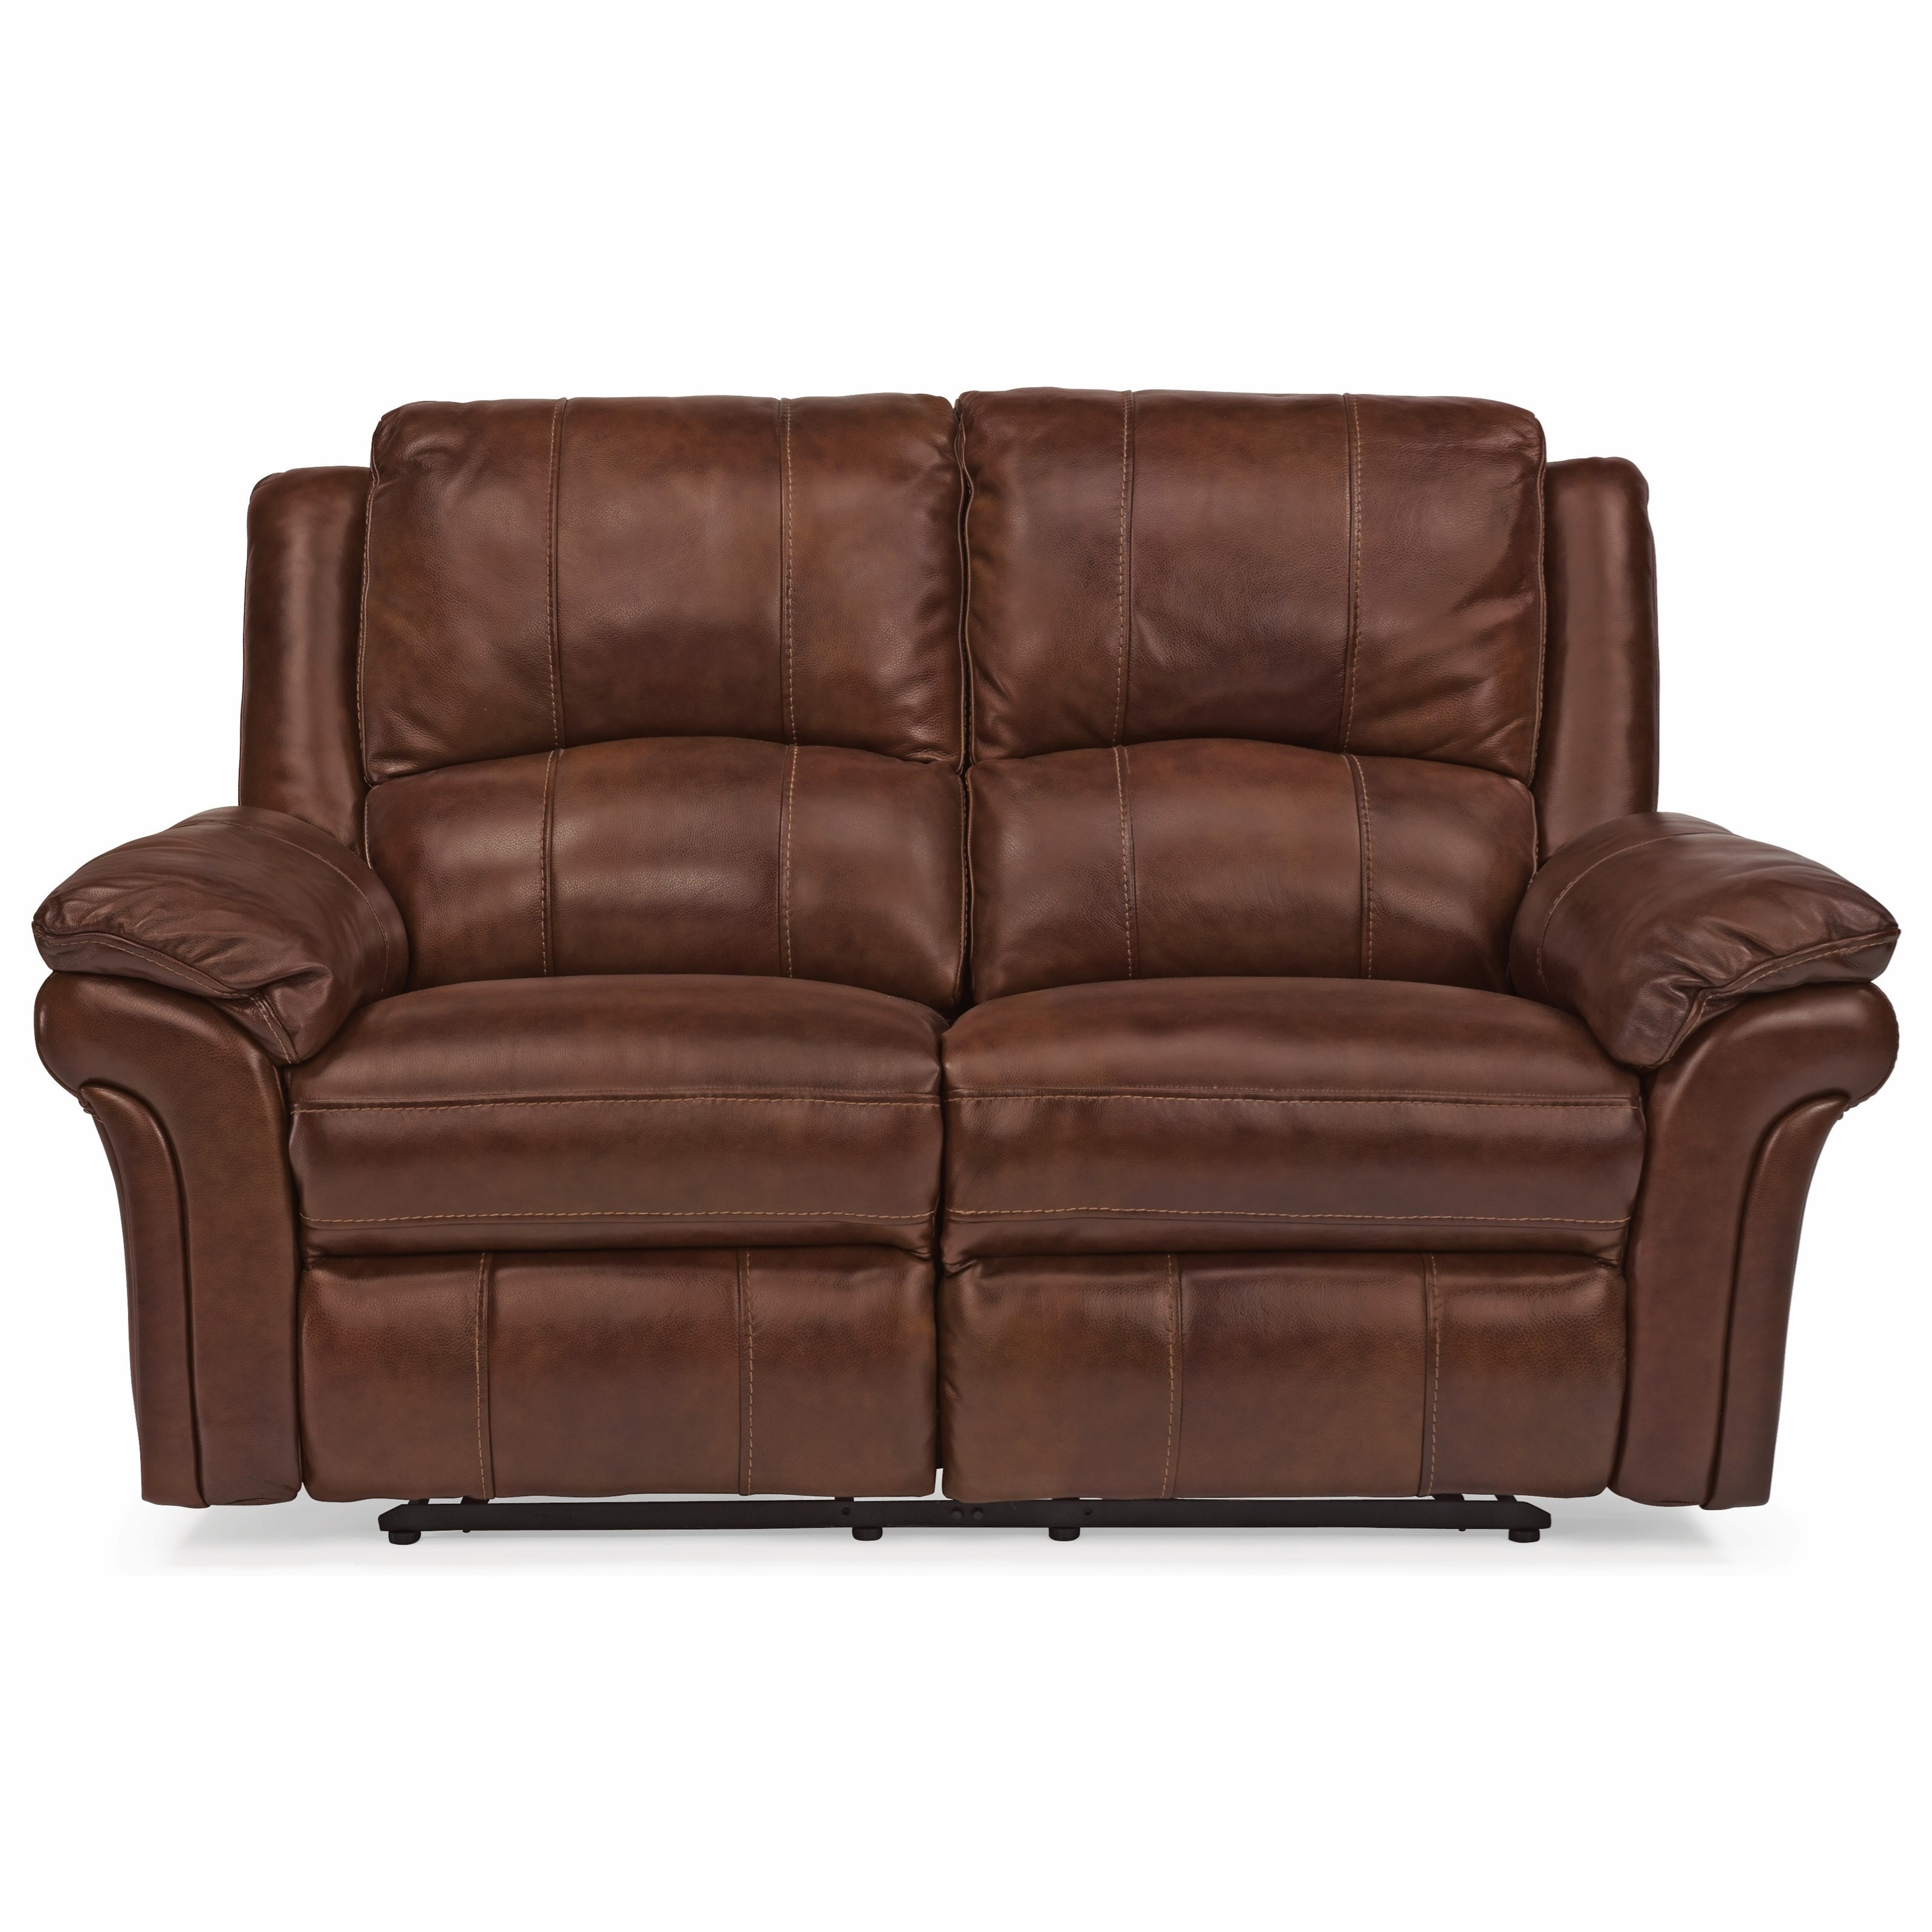 Flexsteel latitudes dandridge 1351 60p casual power for Hudsons furniture